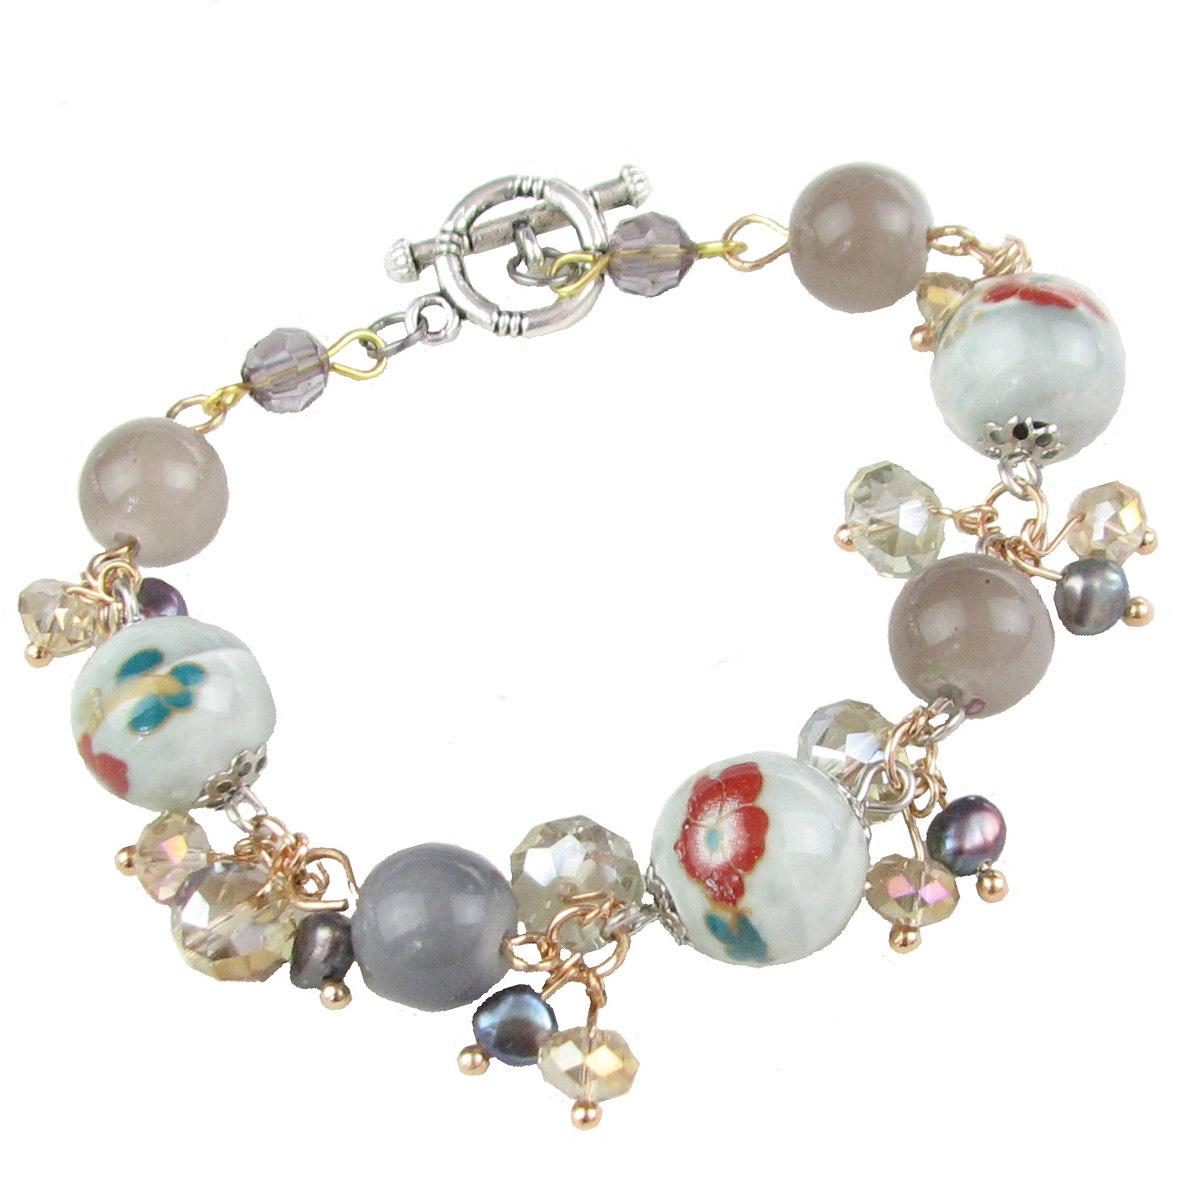 2013 Enamel glaze pearl agate bracelet female fashion vintage girlfriend birthday present gifts(China (Mainland))